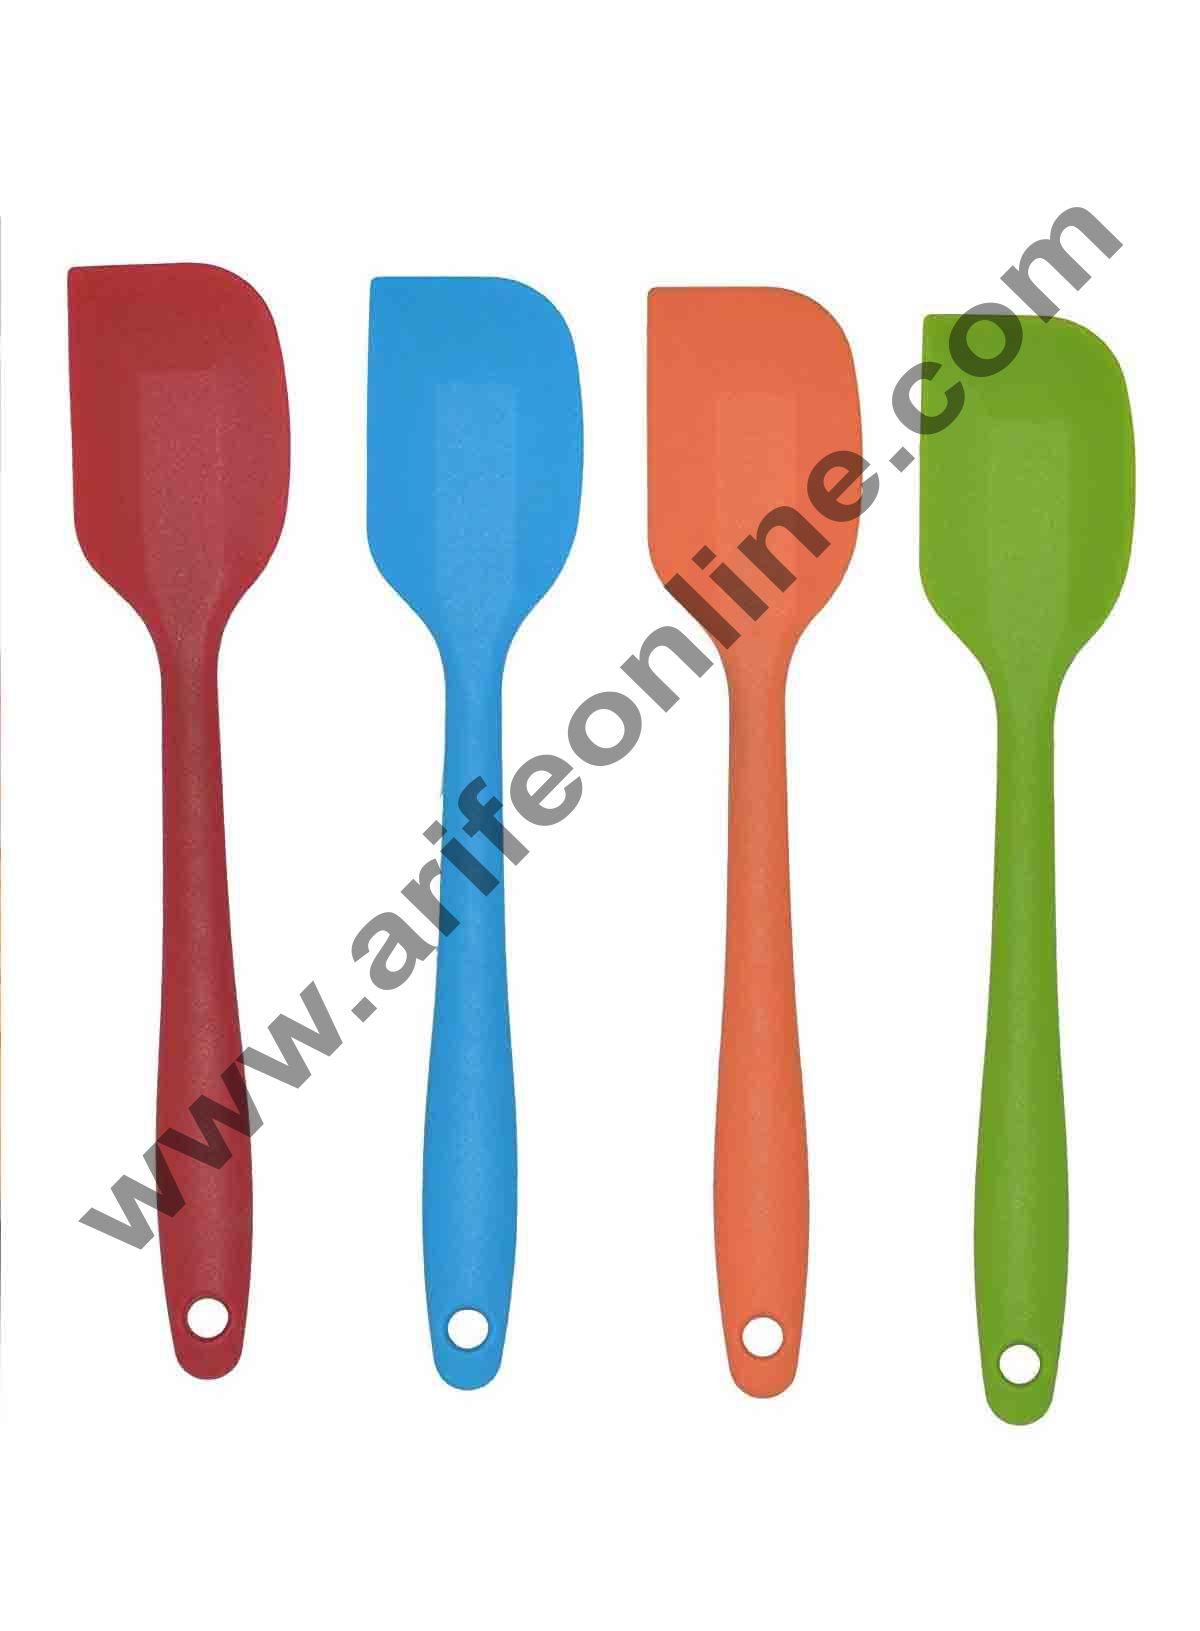 Cake Decor 1Pcs Silicone Batter Spatula Cake Cream Mixer Long Handled Models Baking Scraper Kitchen Cooking Tool Random Color